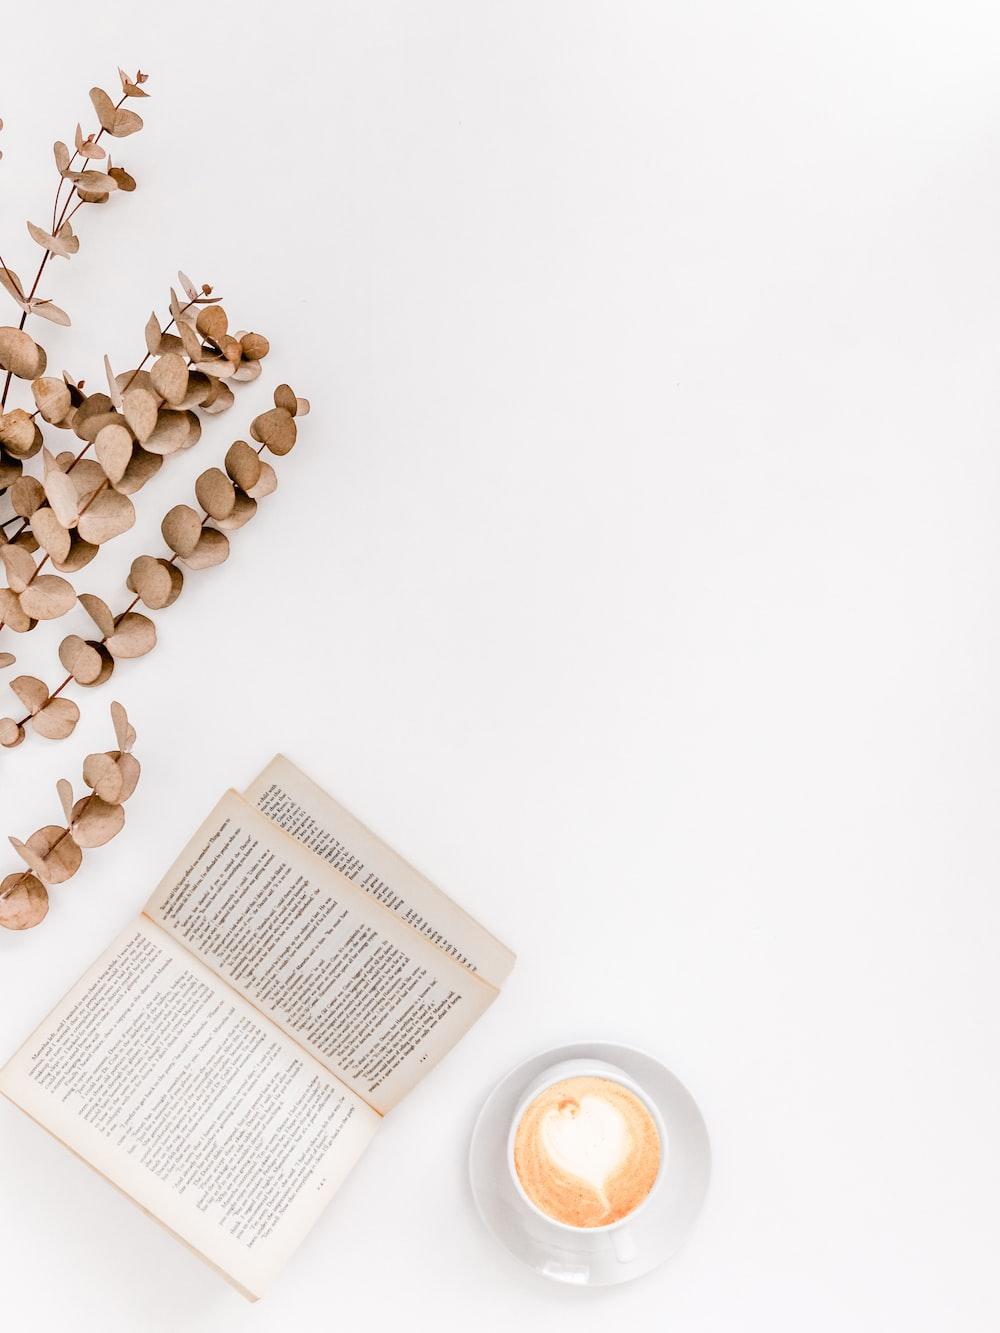 white ceramic mug beside white book